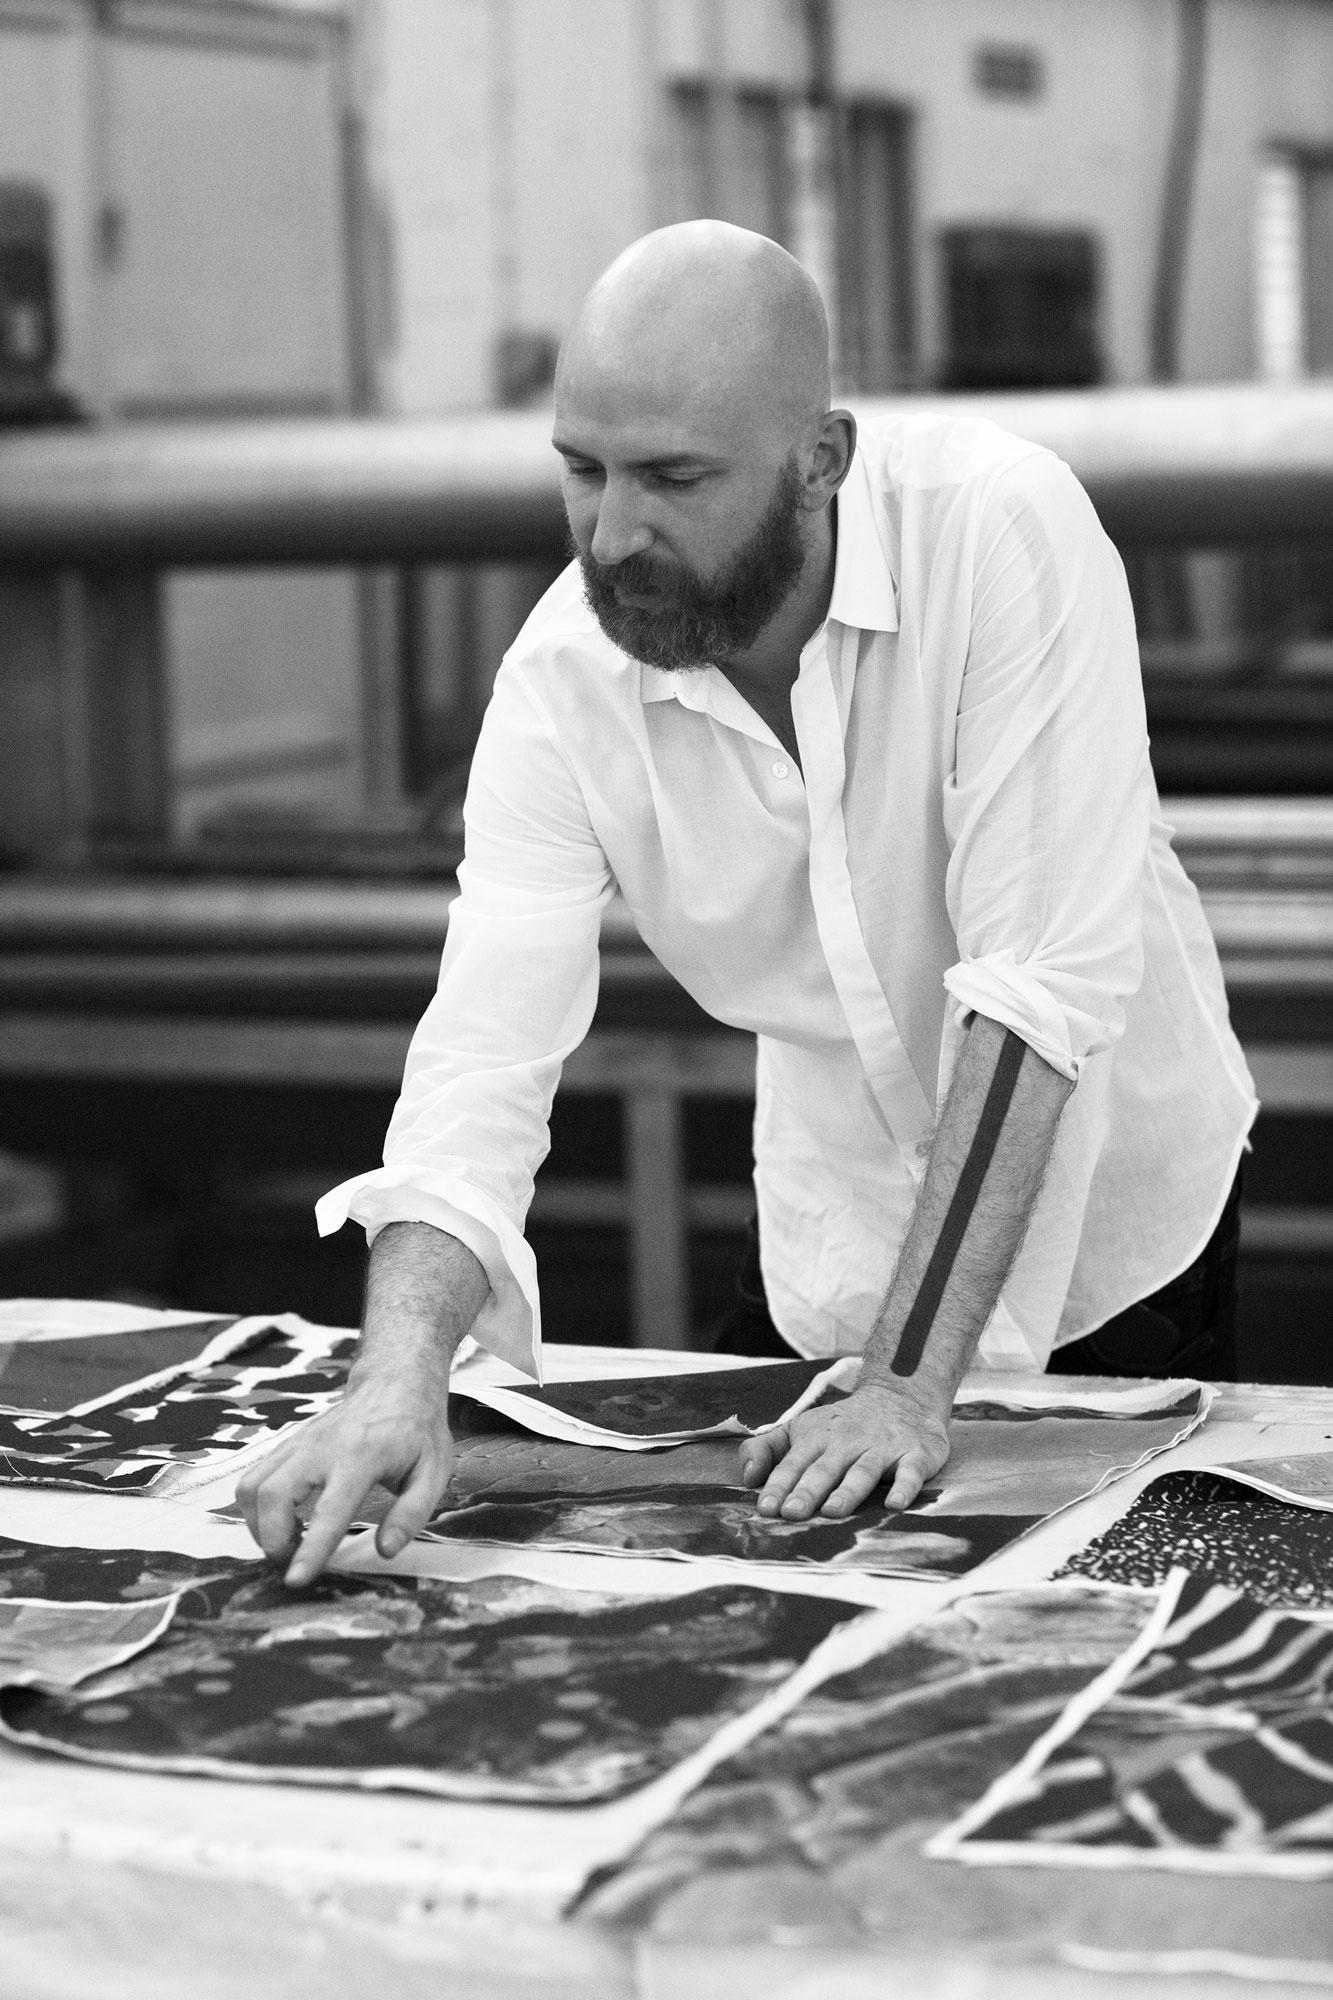 annanstans launching world wide on march 8th - Martin Bergström x Ikea / skarp creative